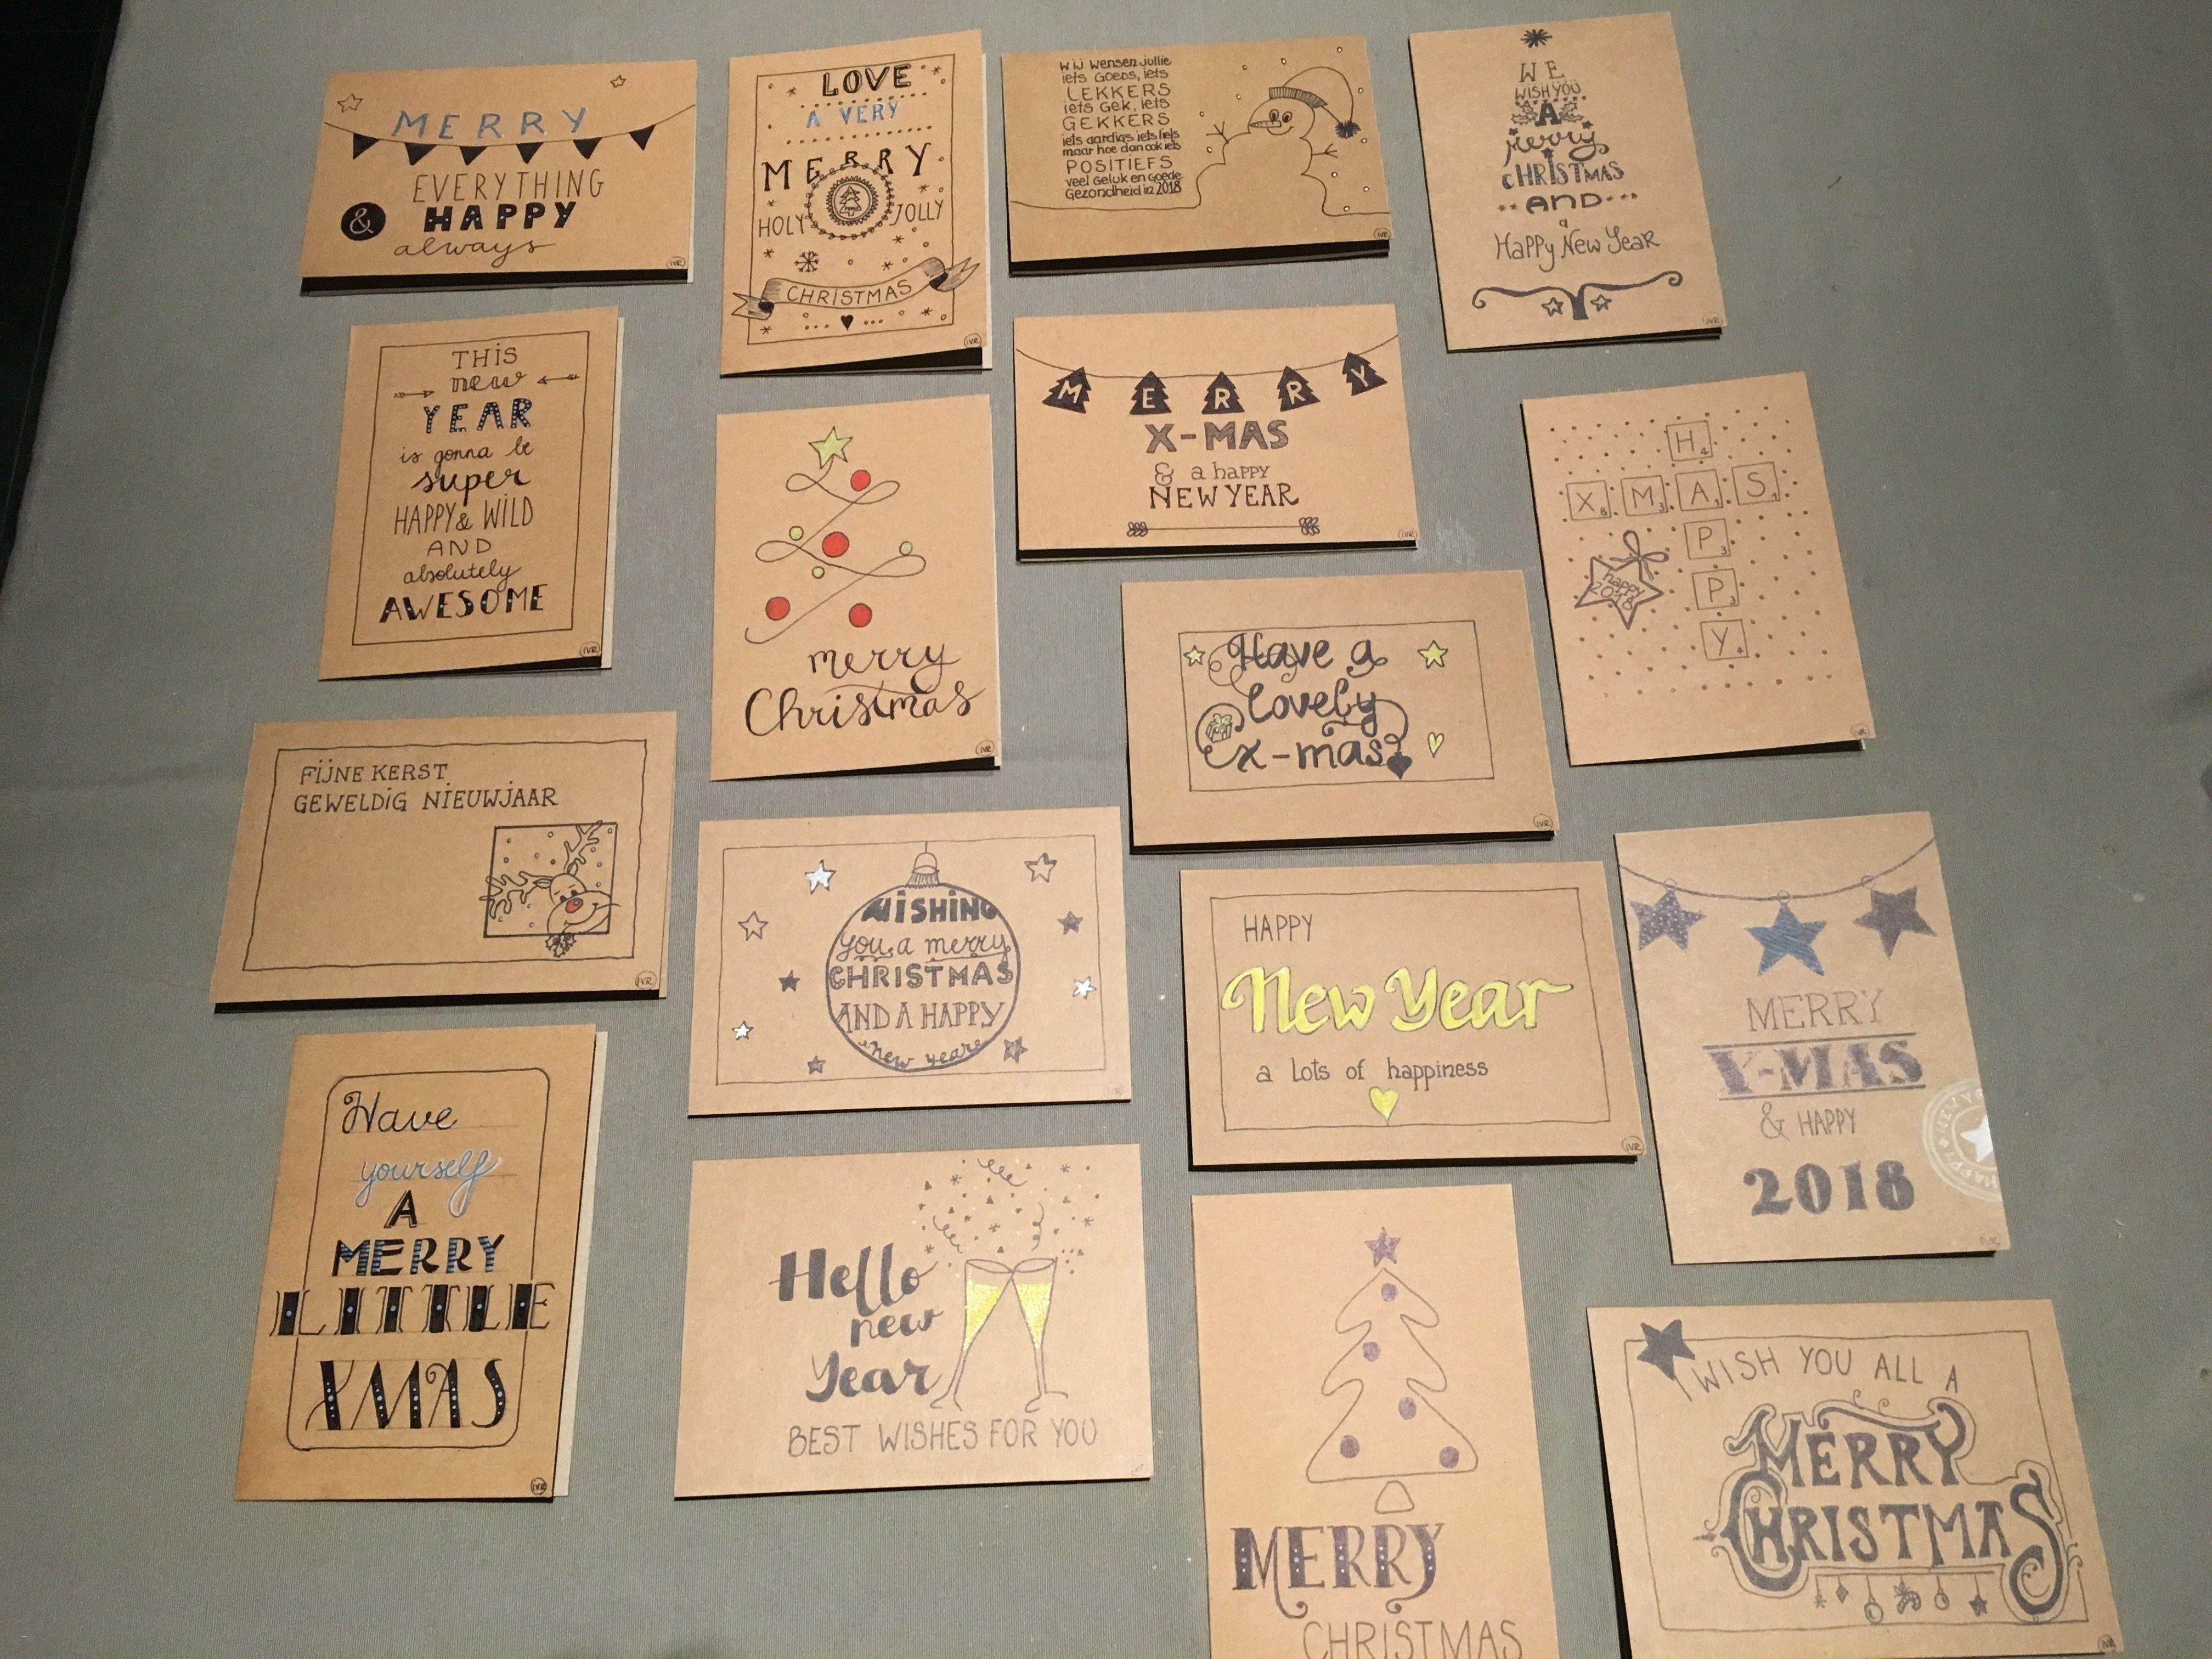 Kreative Weihnachtskarten.Kreative Weihnachtskarte Inspirierend Kreative Weihnachtskarten